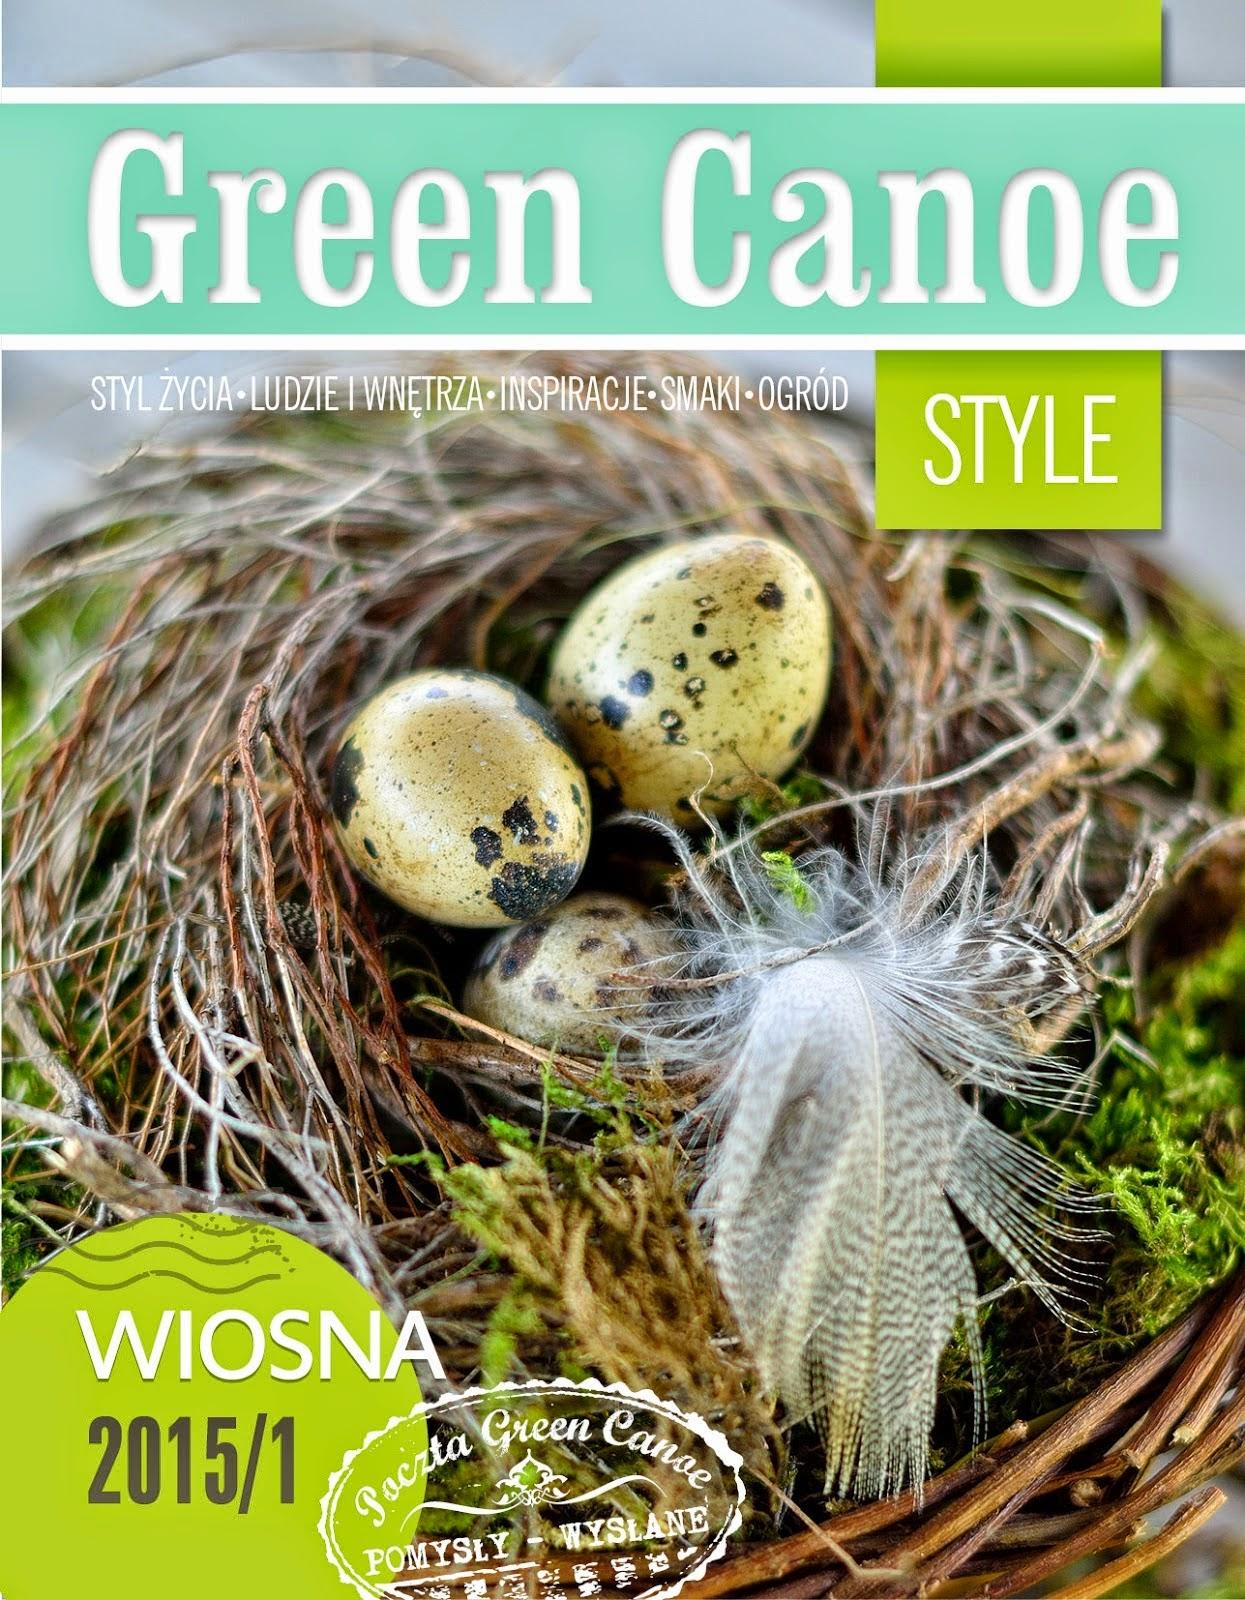 http://issuu.com/greencanoe/docs/gcs-2015_wiosna